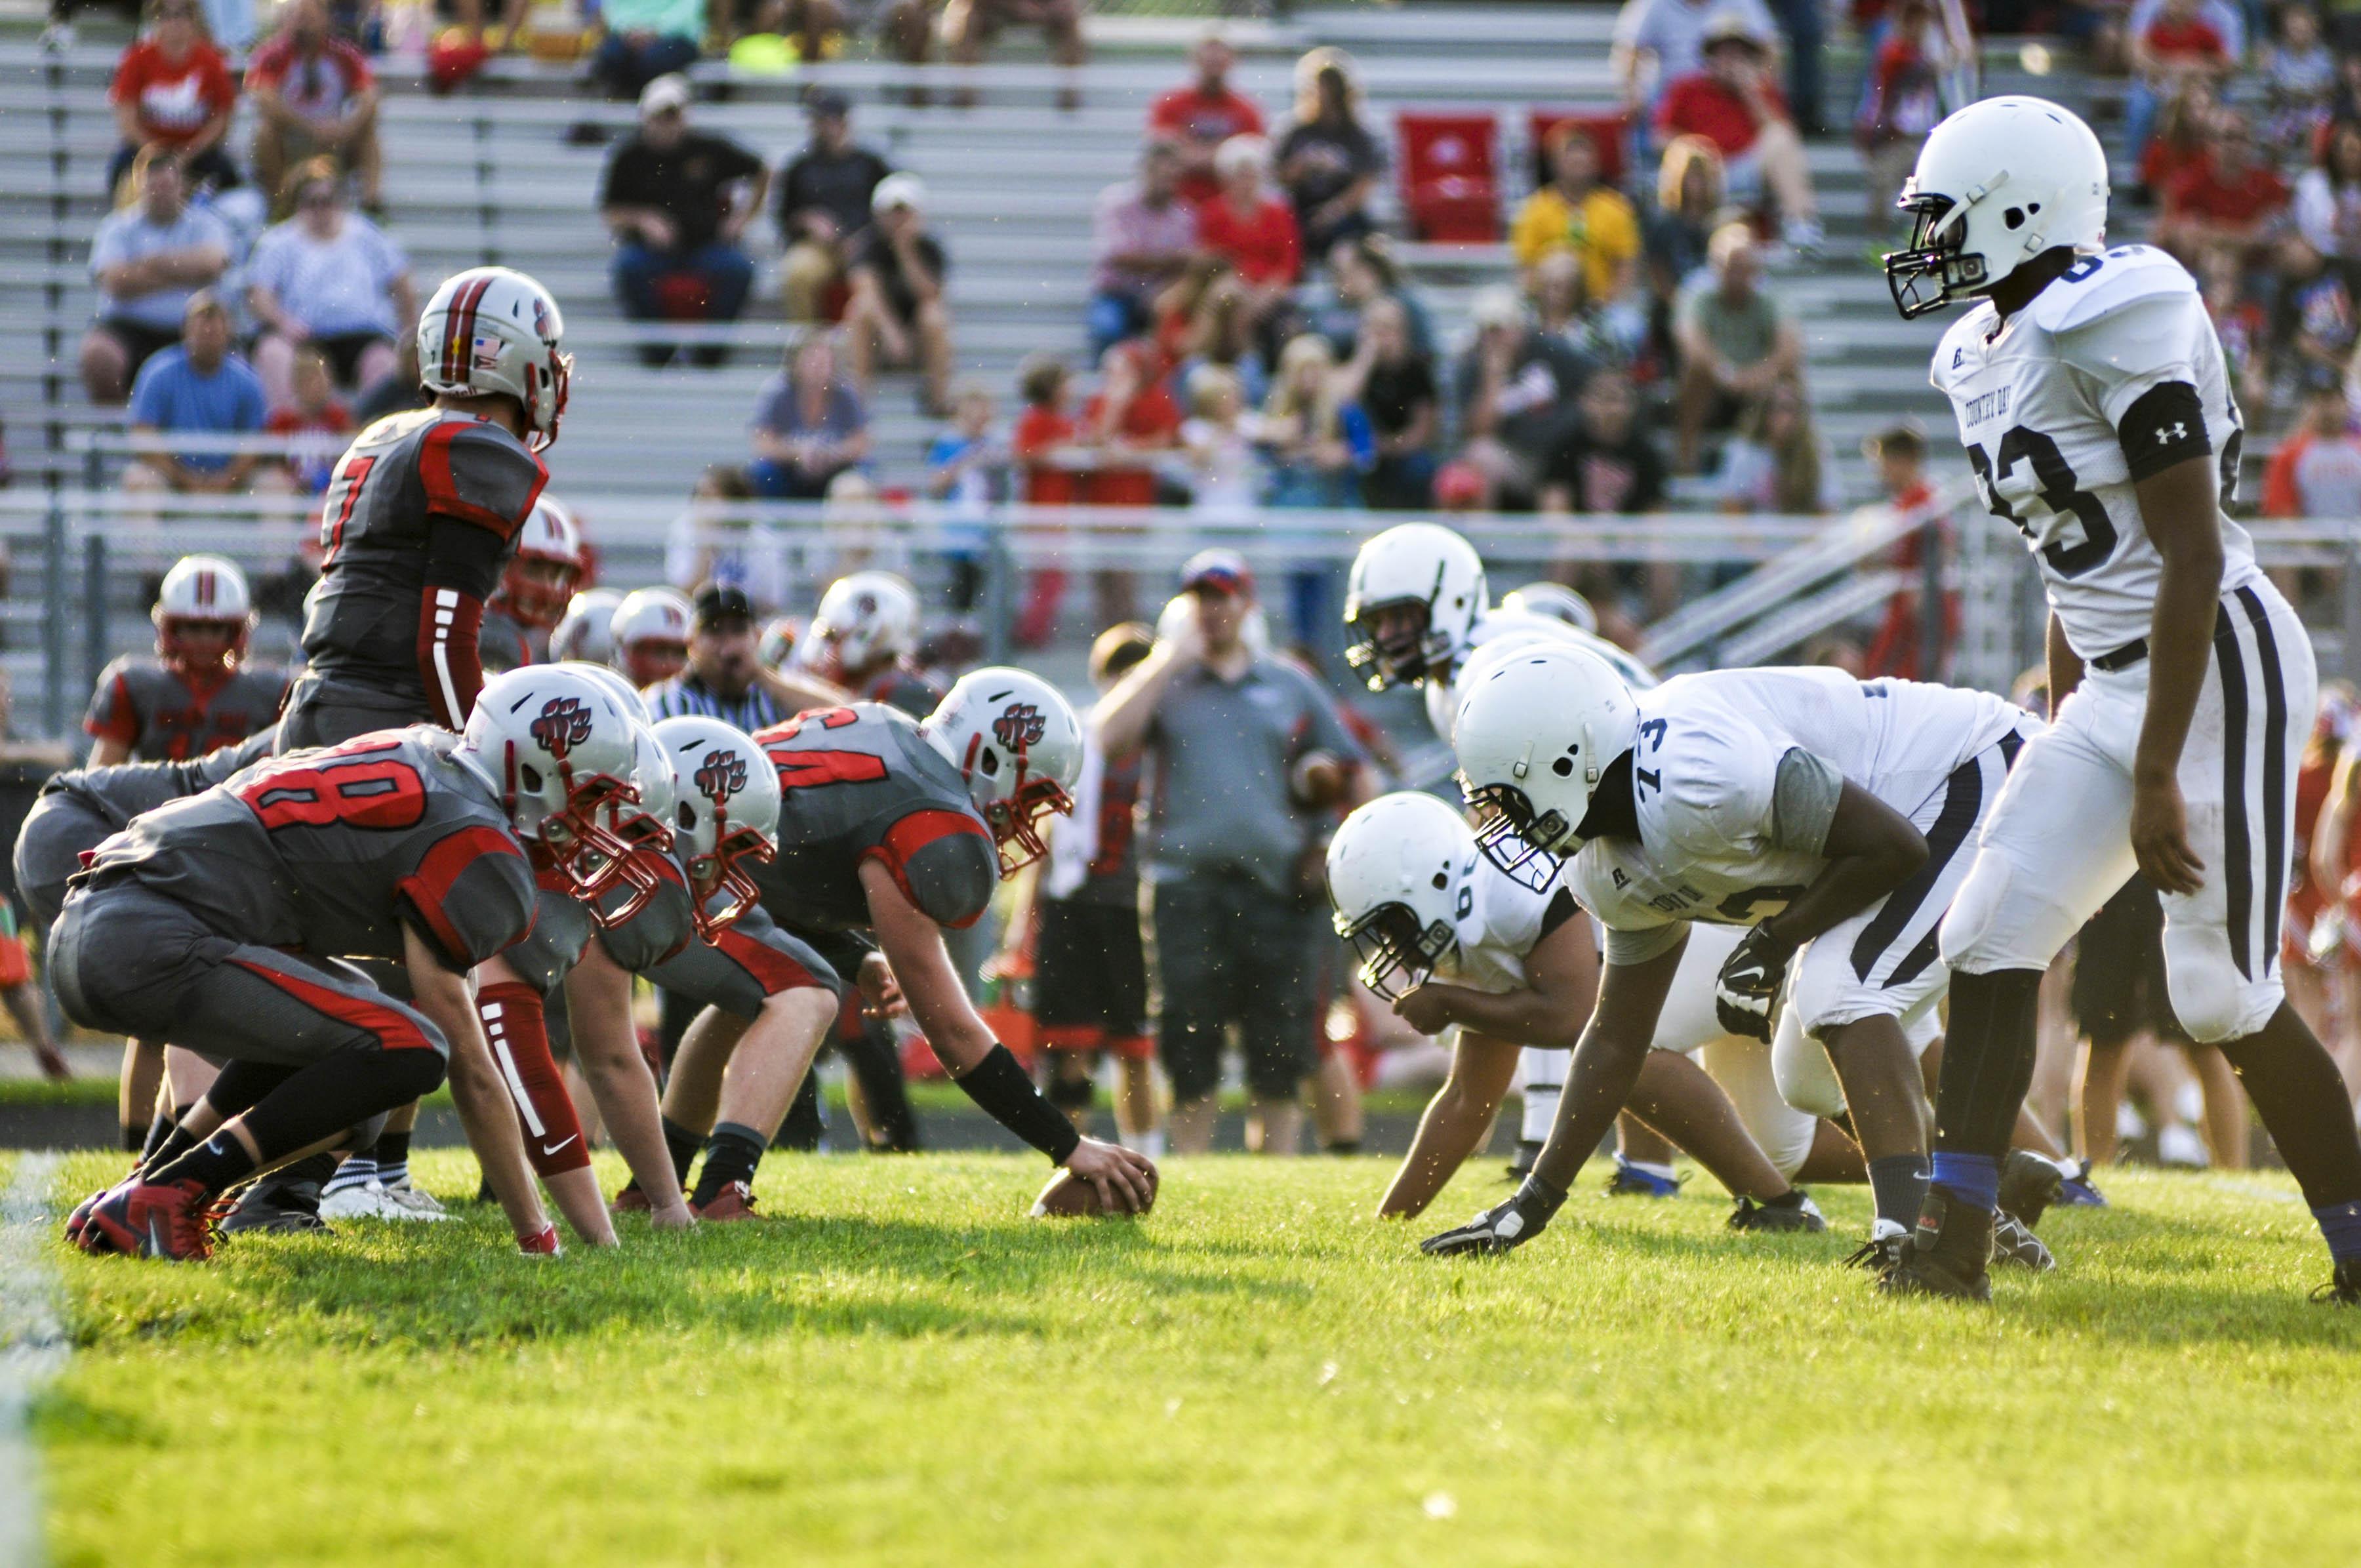 Football Regular Season Opener vs. Bethel Tate